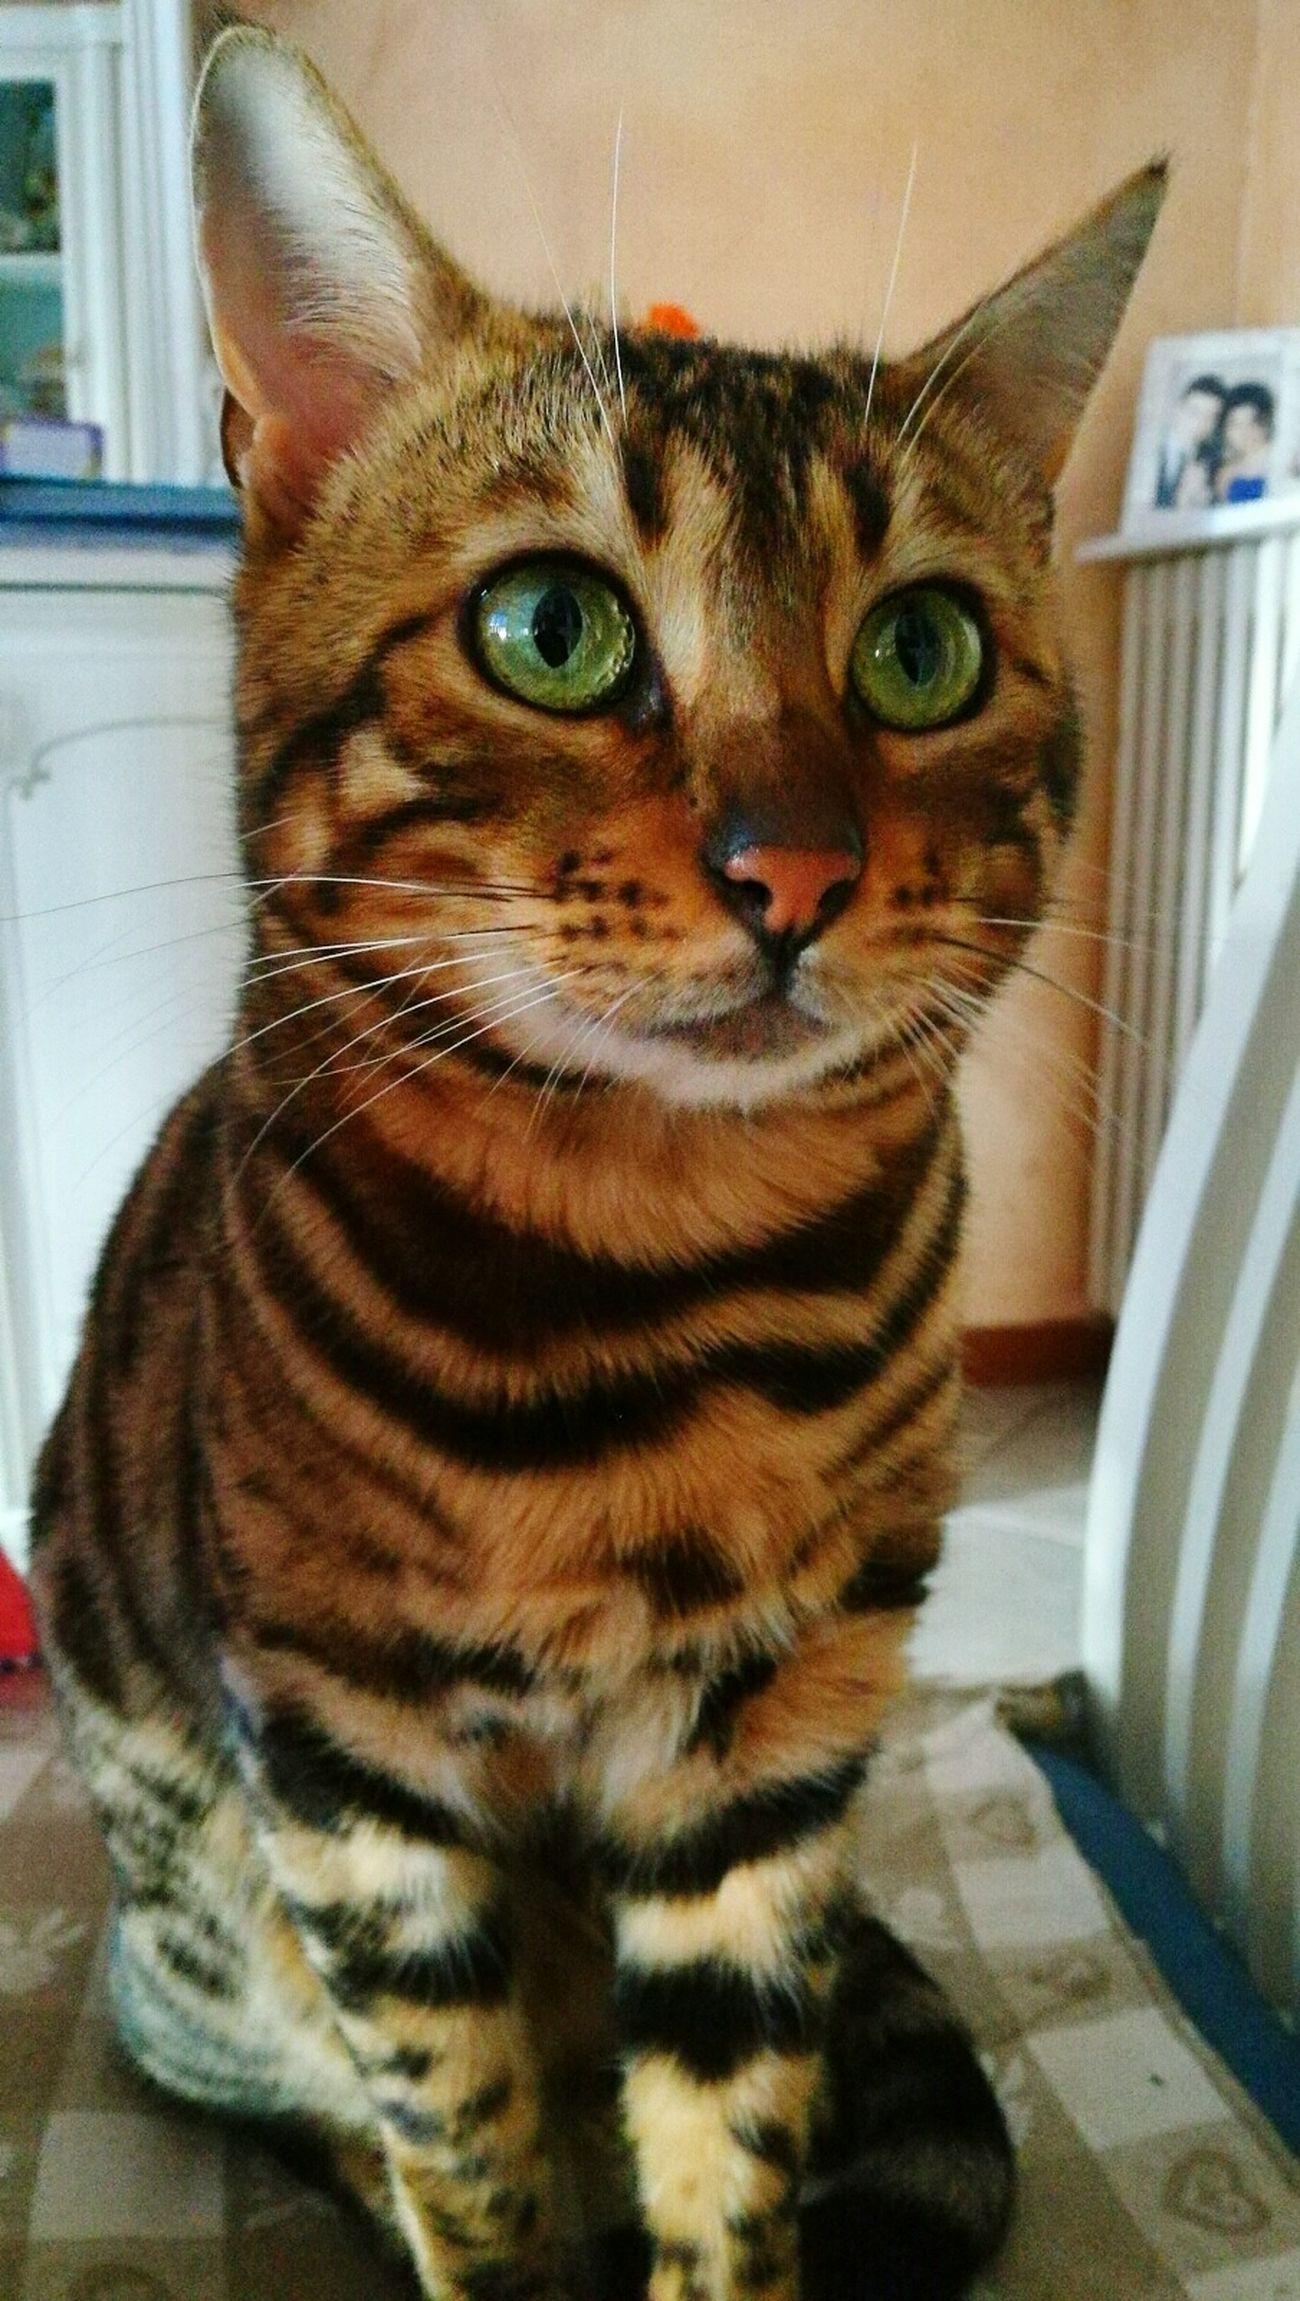 Domestic Cat Pets Feline Animal Eye Domestic Animals Cat Animal Themes Cats Cat Lovers Cateyes Eyecat